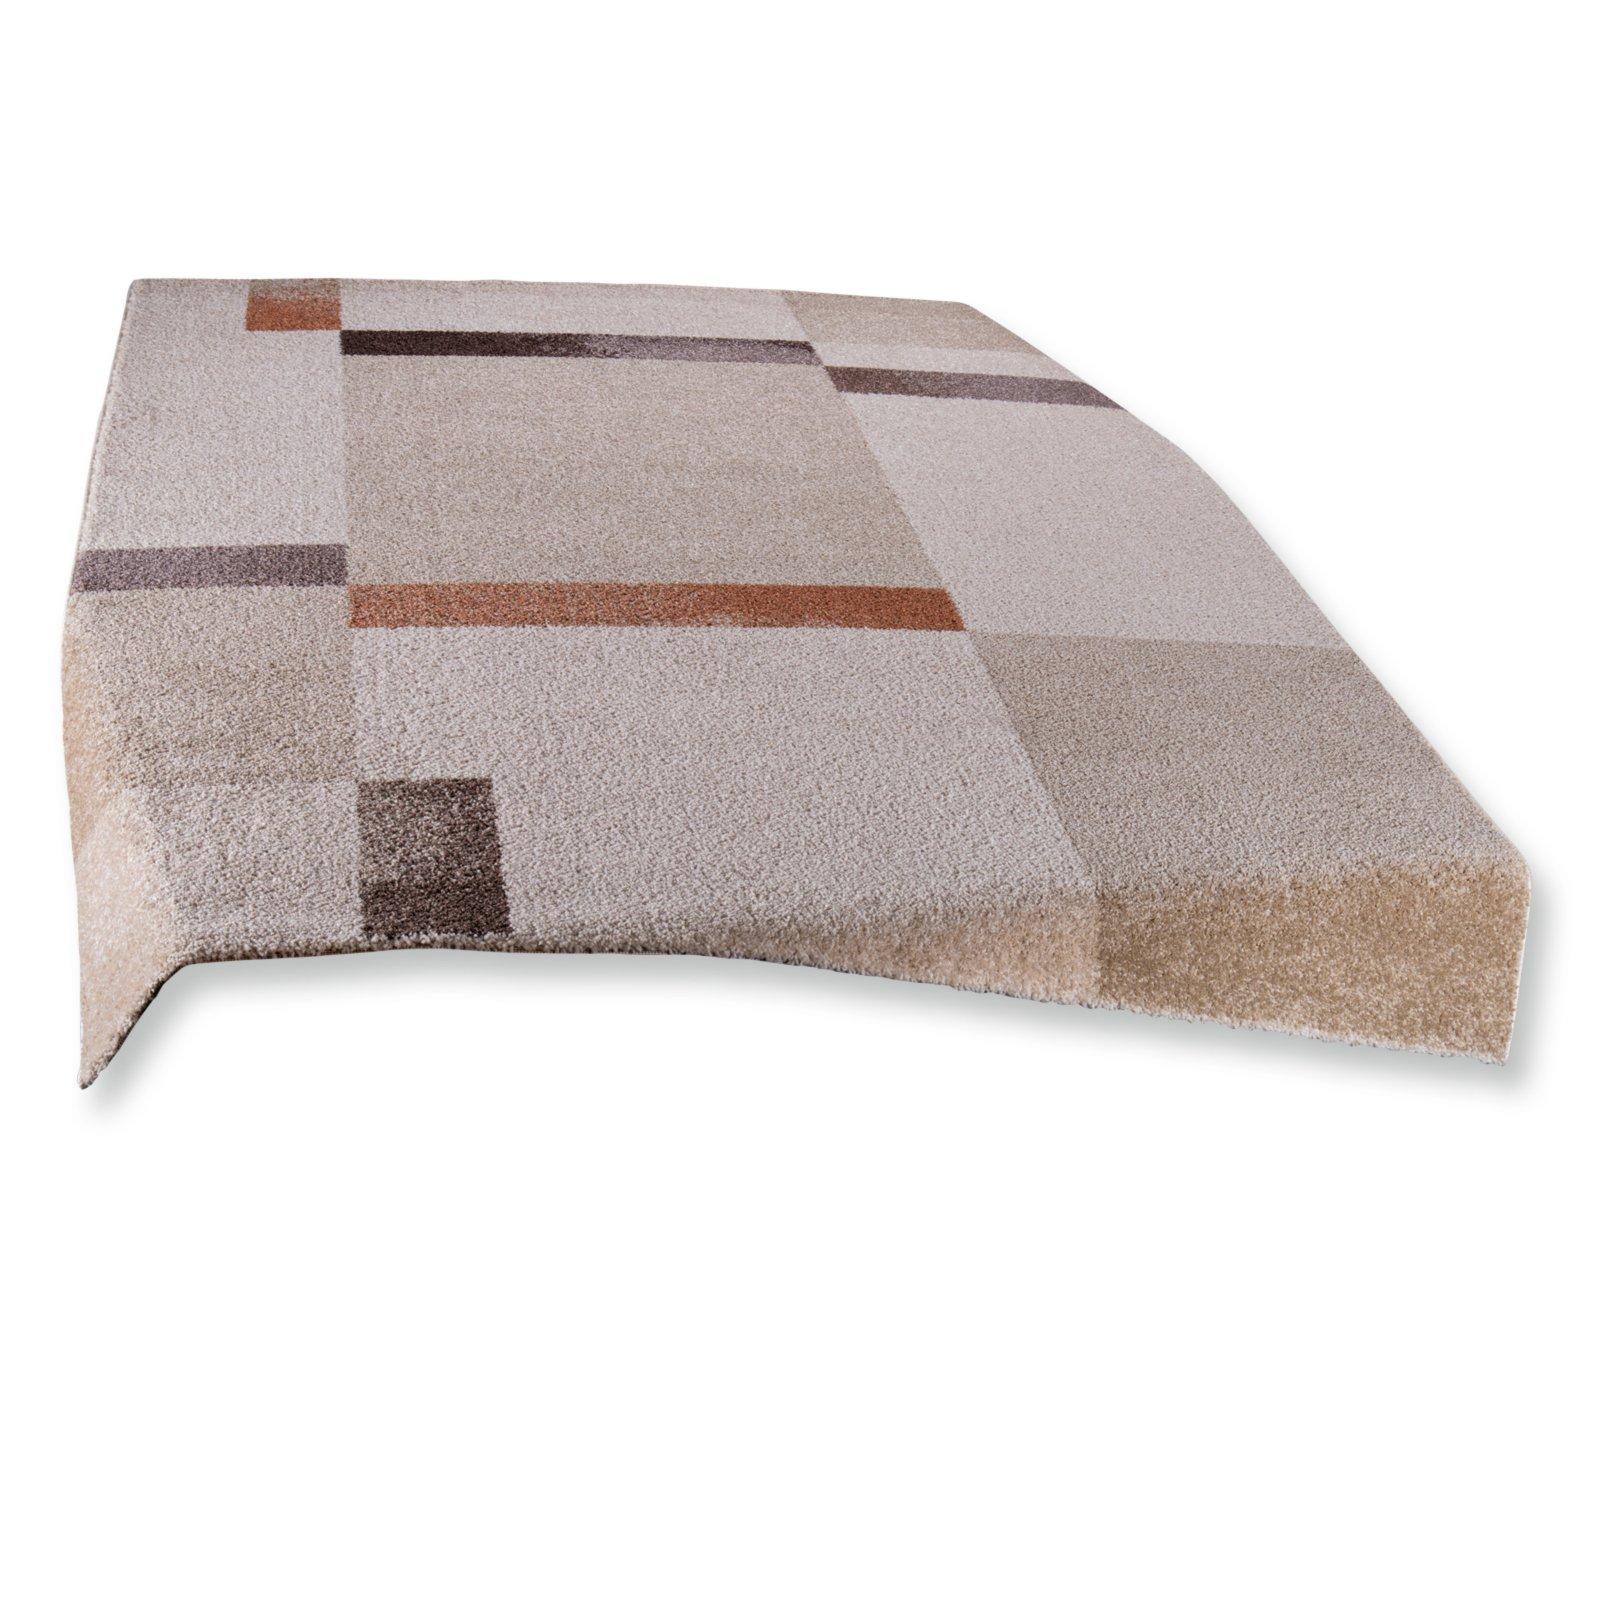 teppich vera beige 120x170 cm gemusterte teppiche. Black Bedroom Furniture Sets. Home Design Ideas